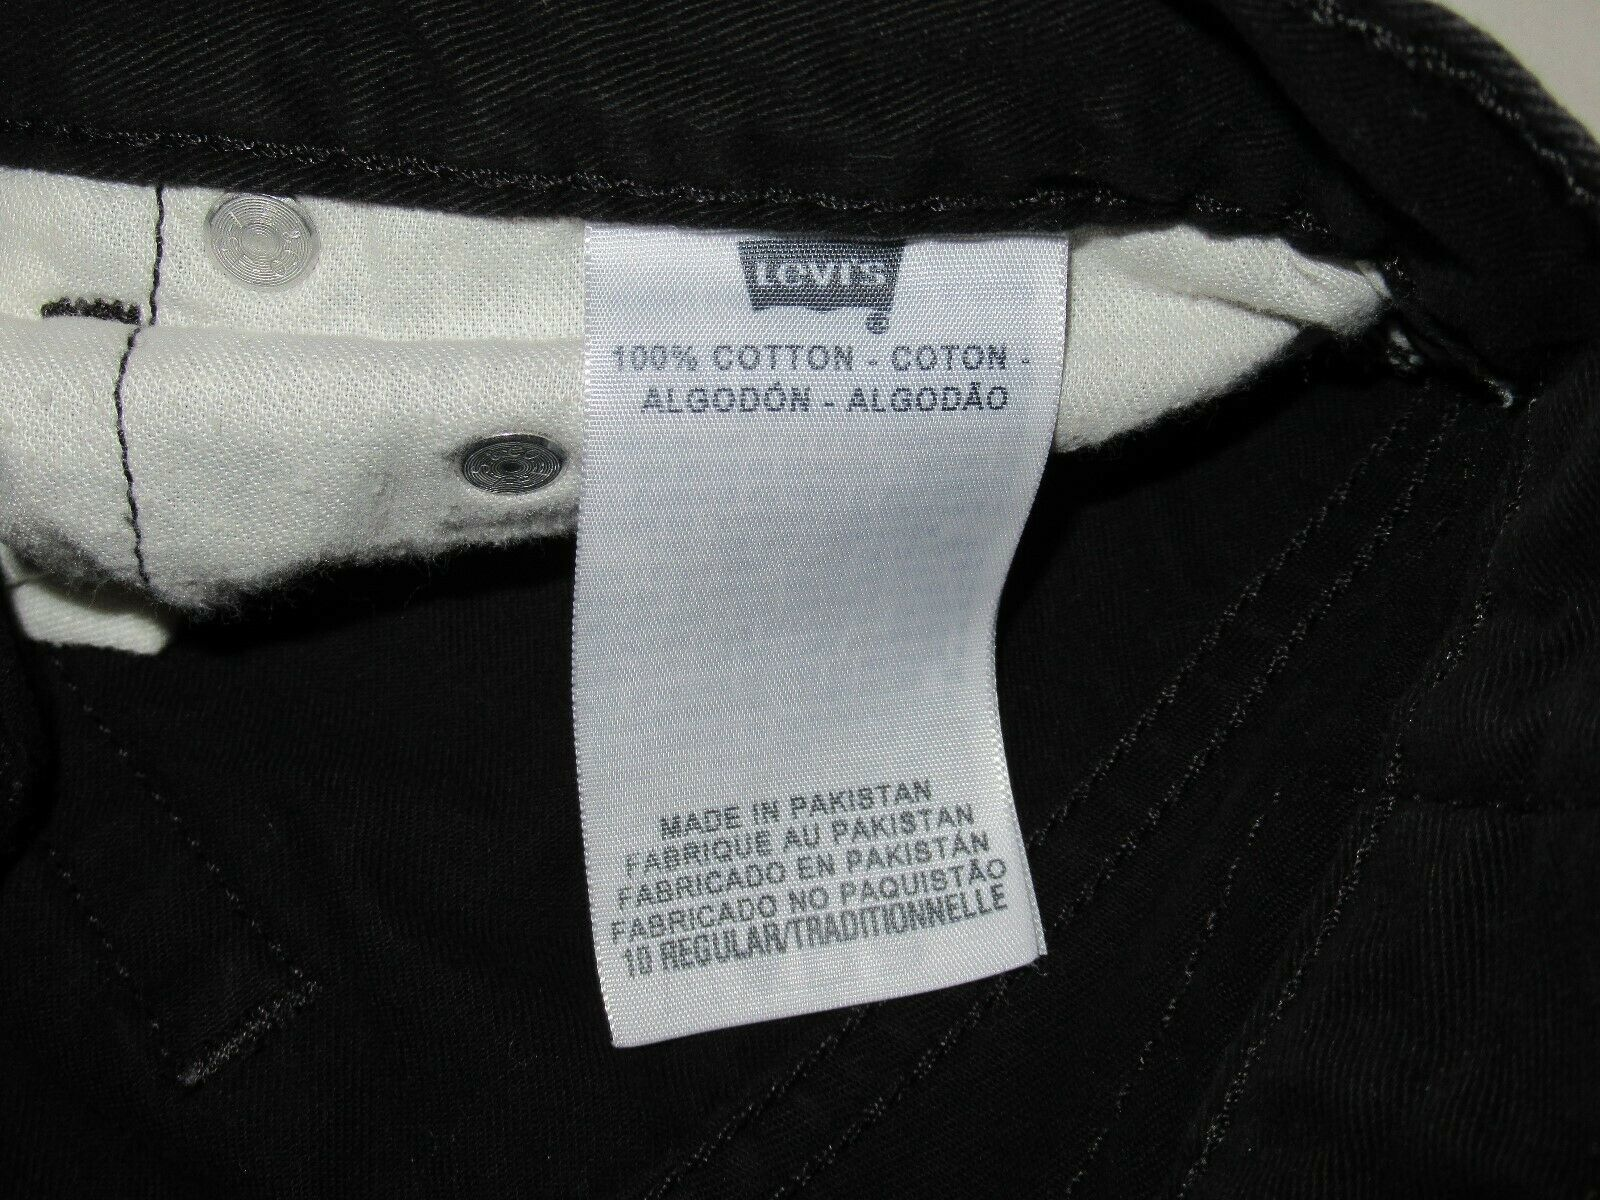 Boys Levis 505 Straight Black Denim Jeans Size 10 Reg Short! Brushed Cotton Warm image 5